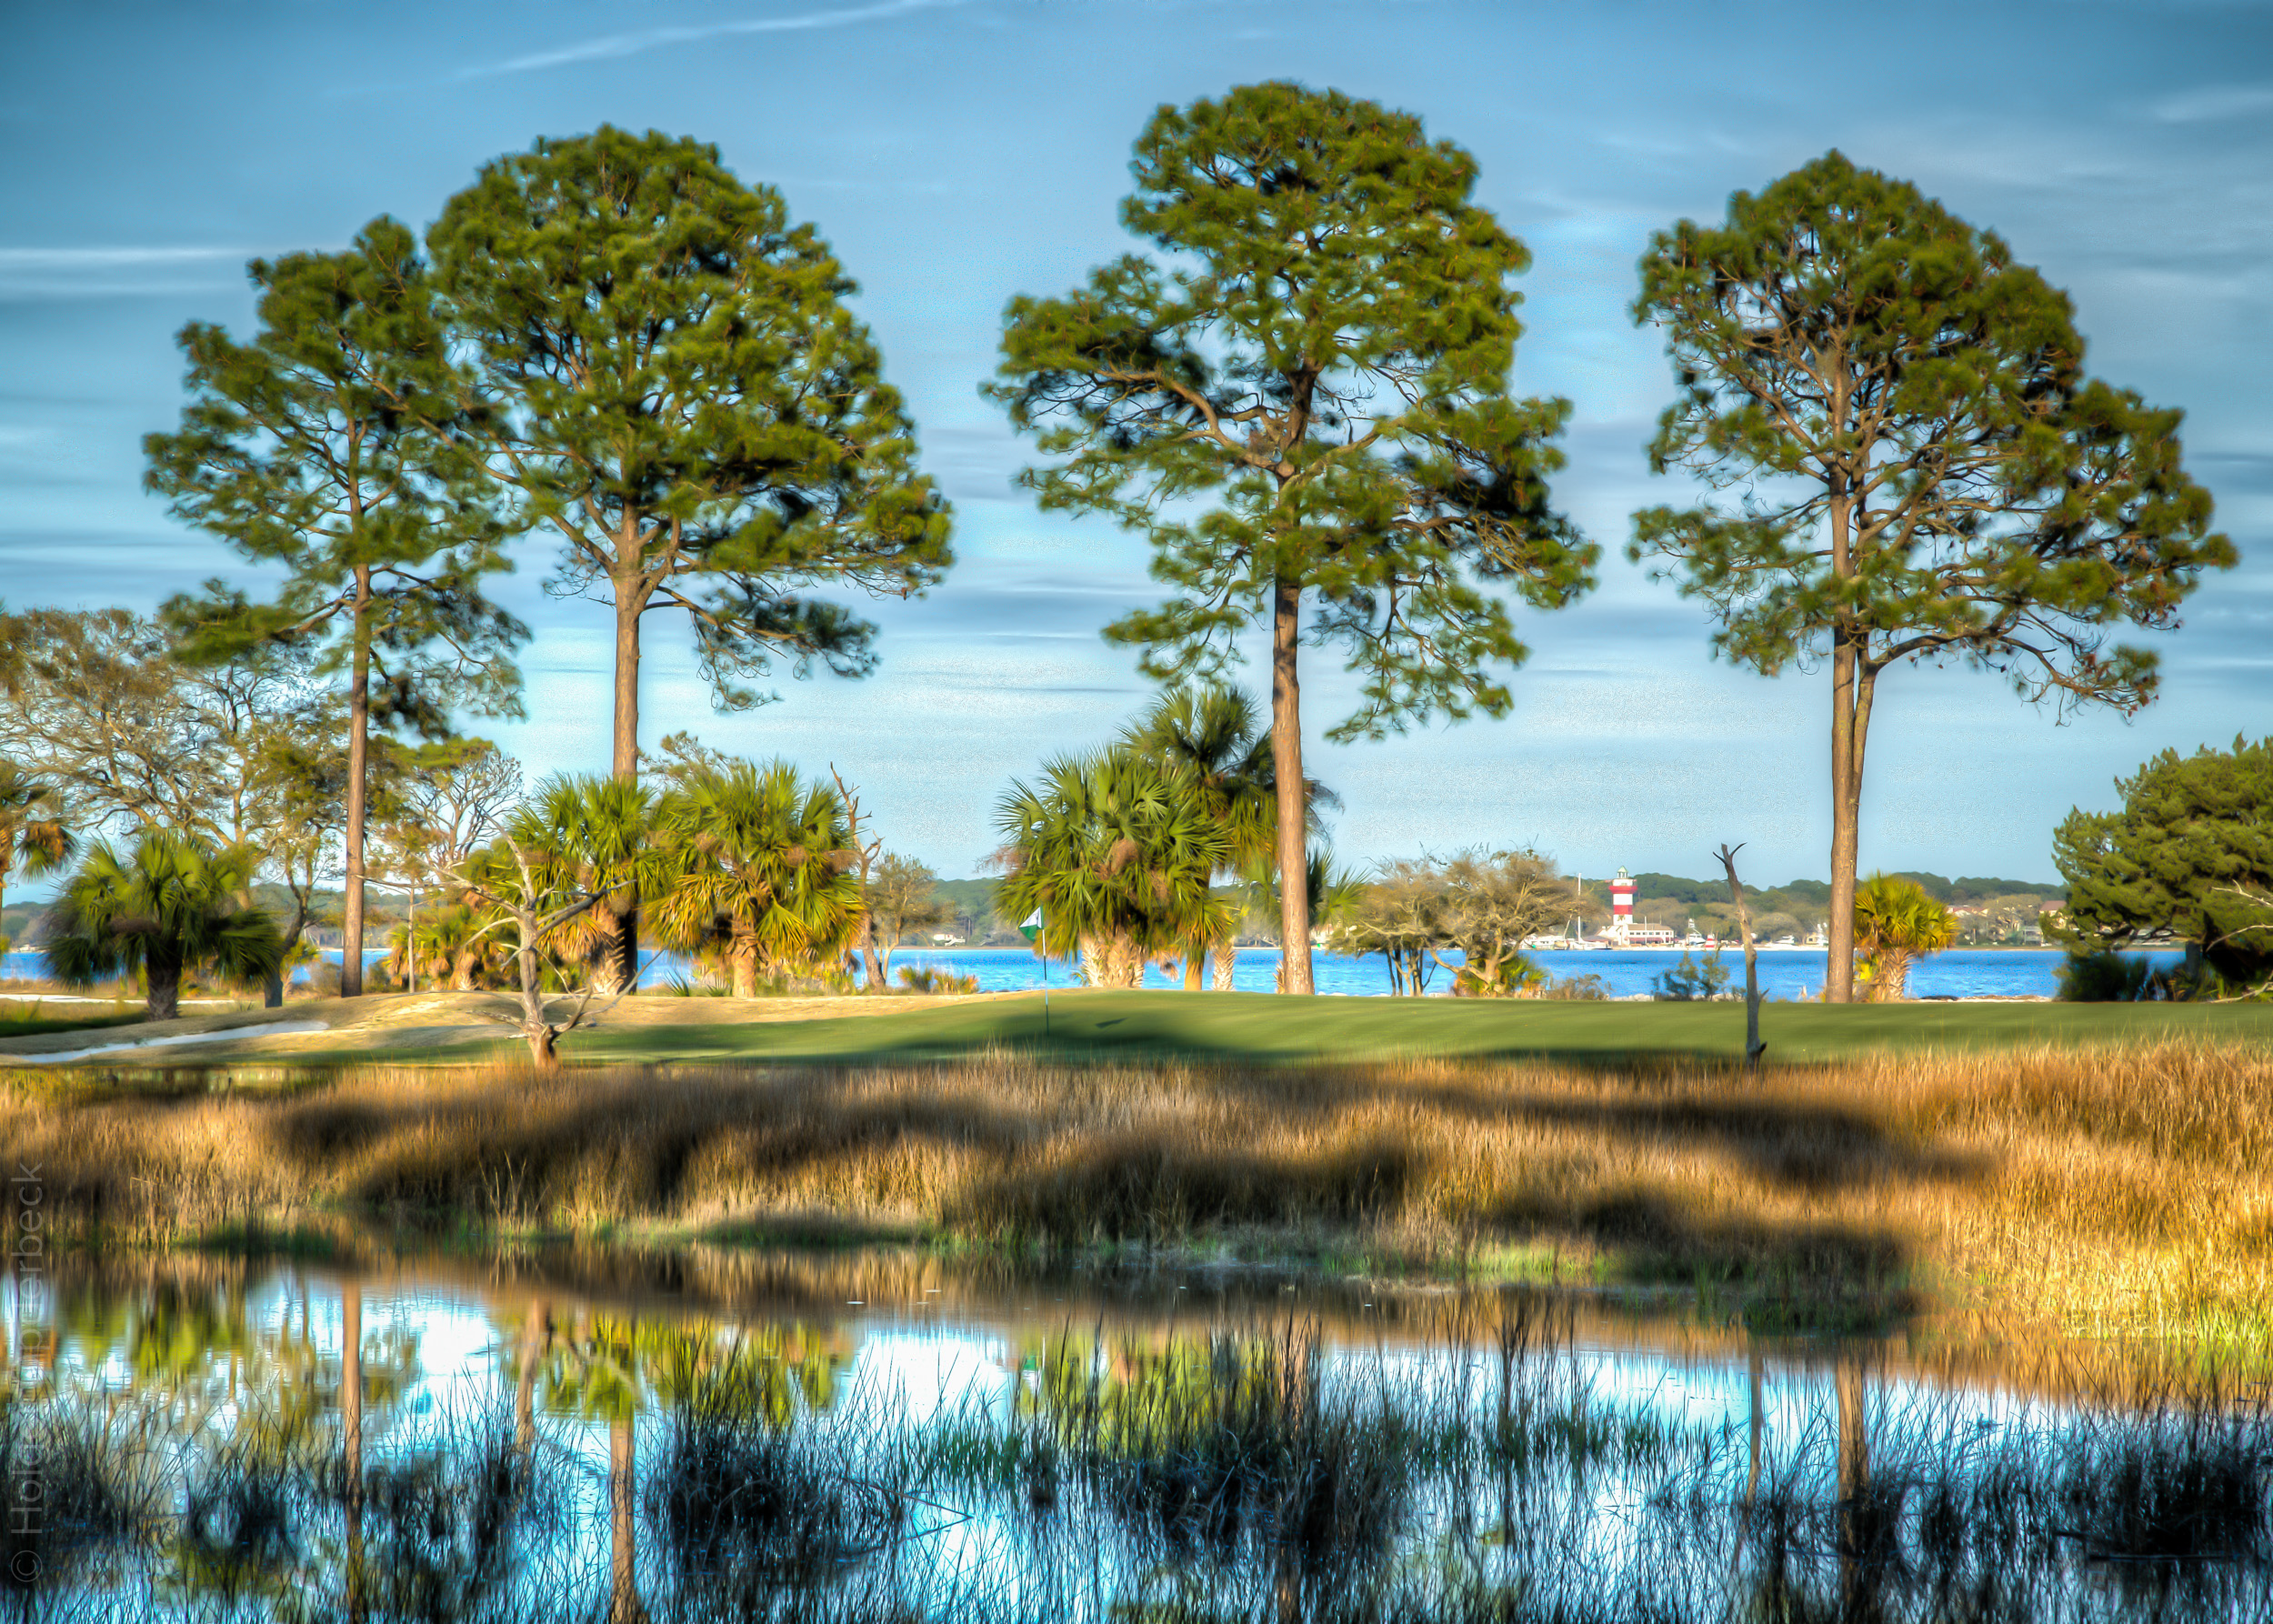 020 8th-green-high-tide-pines-harbortown.jpg